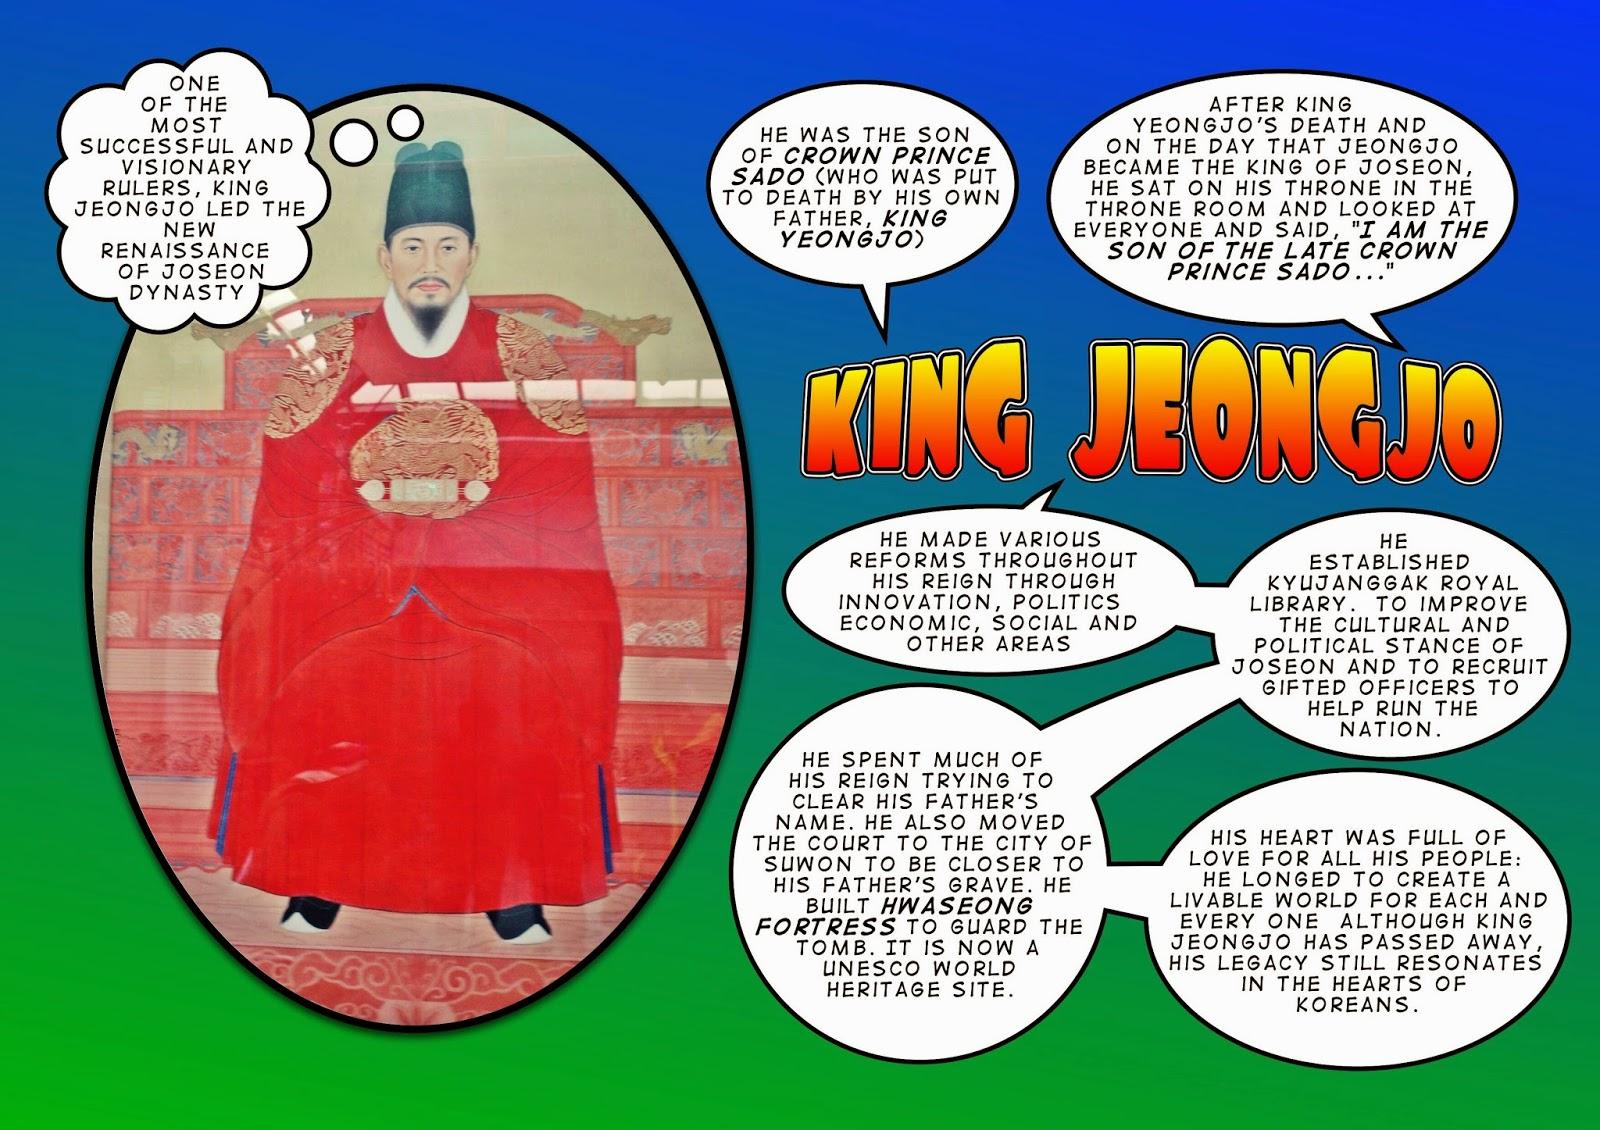 Gyeonggijeon Royal Portrait Museum 어진박물관 | meheartsoul.blogspot.com